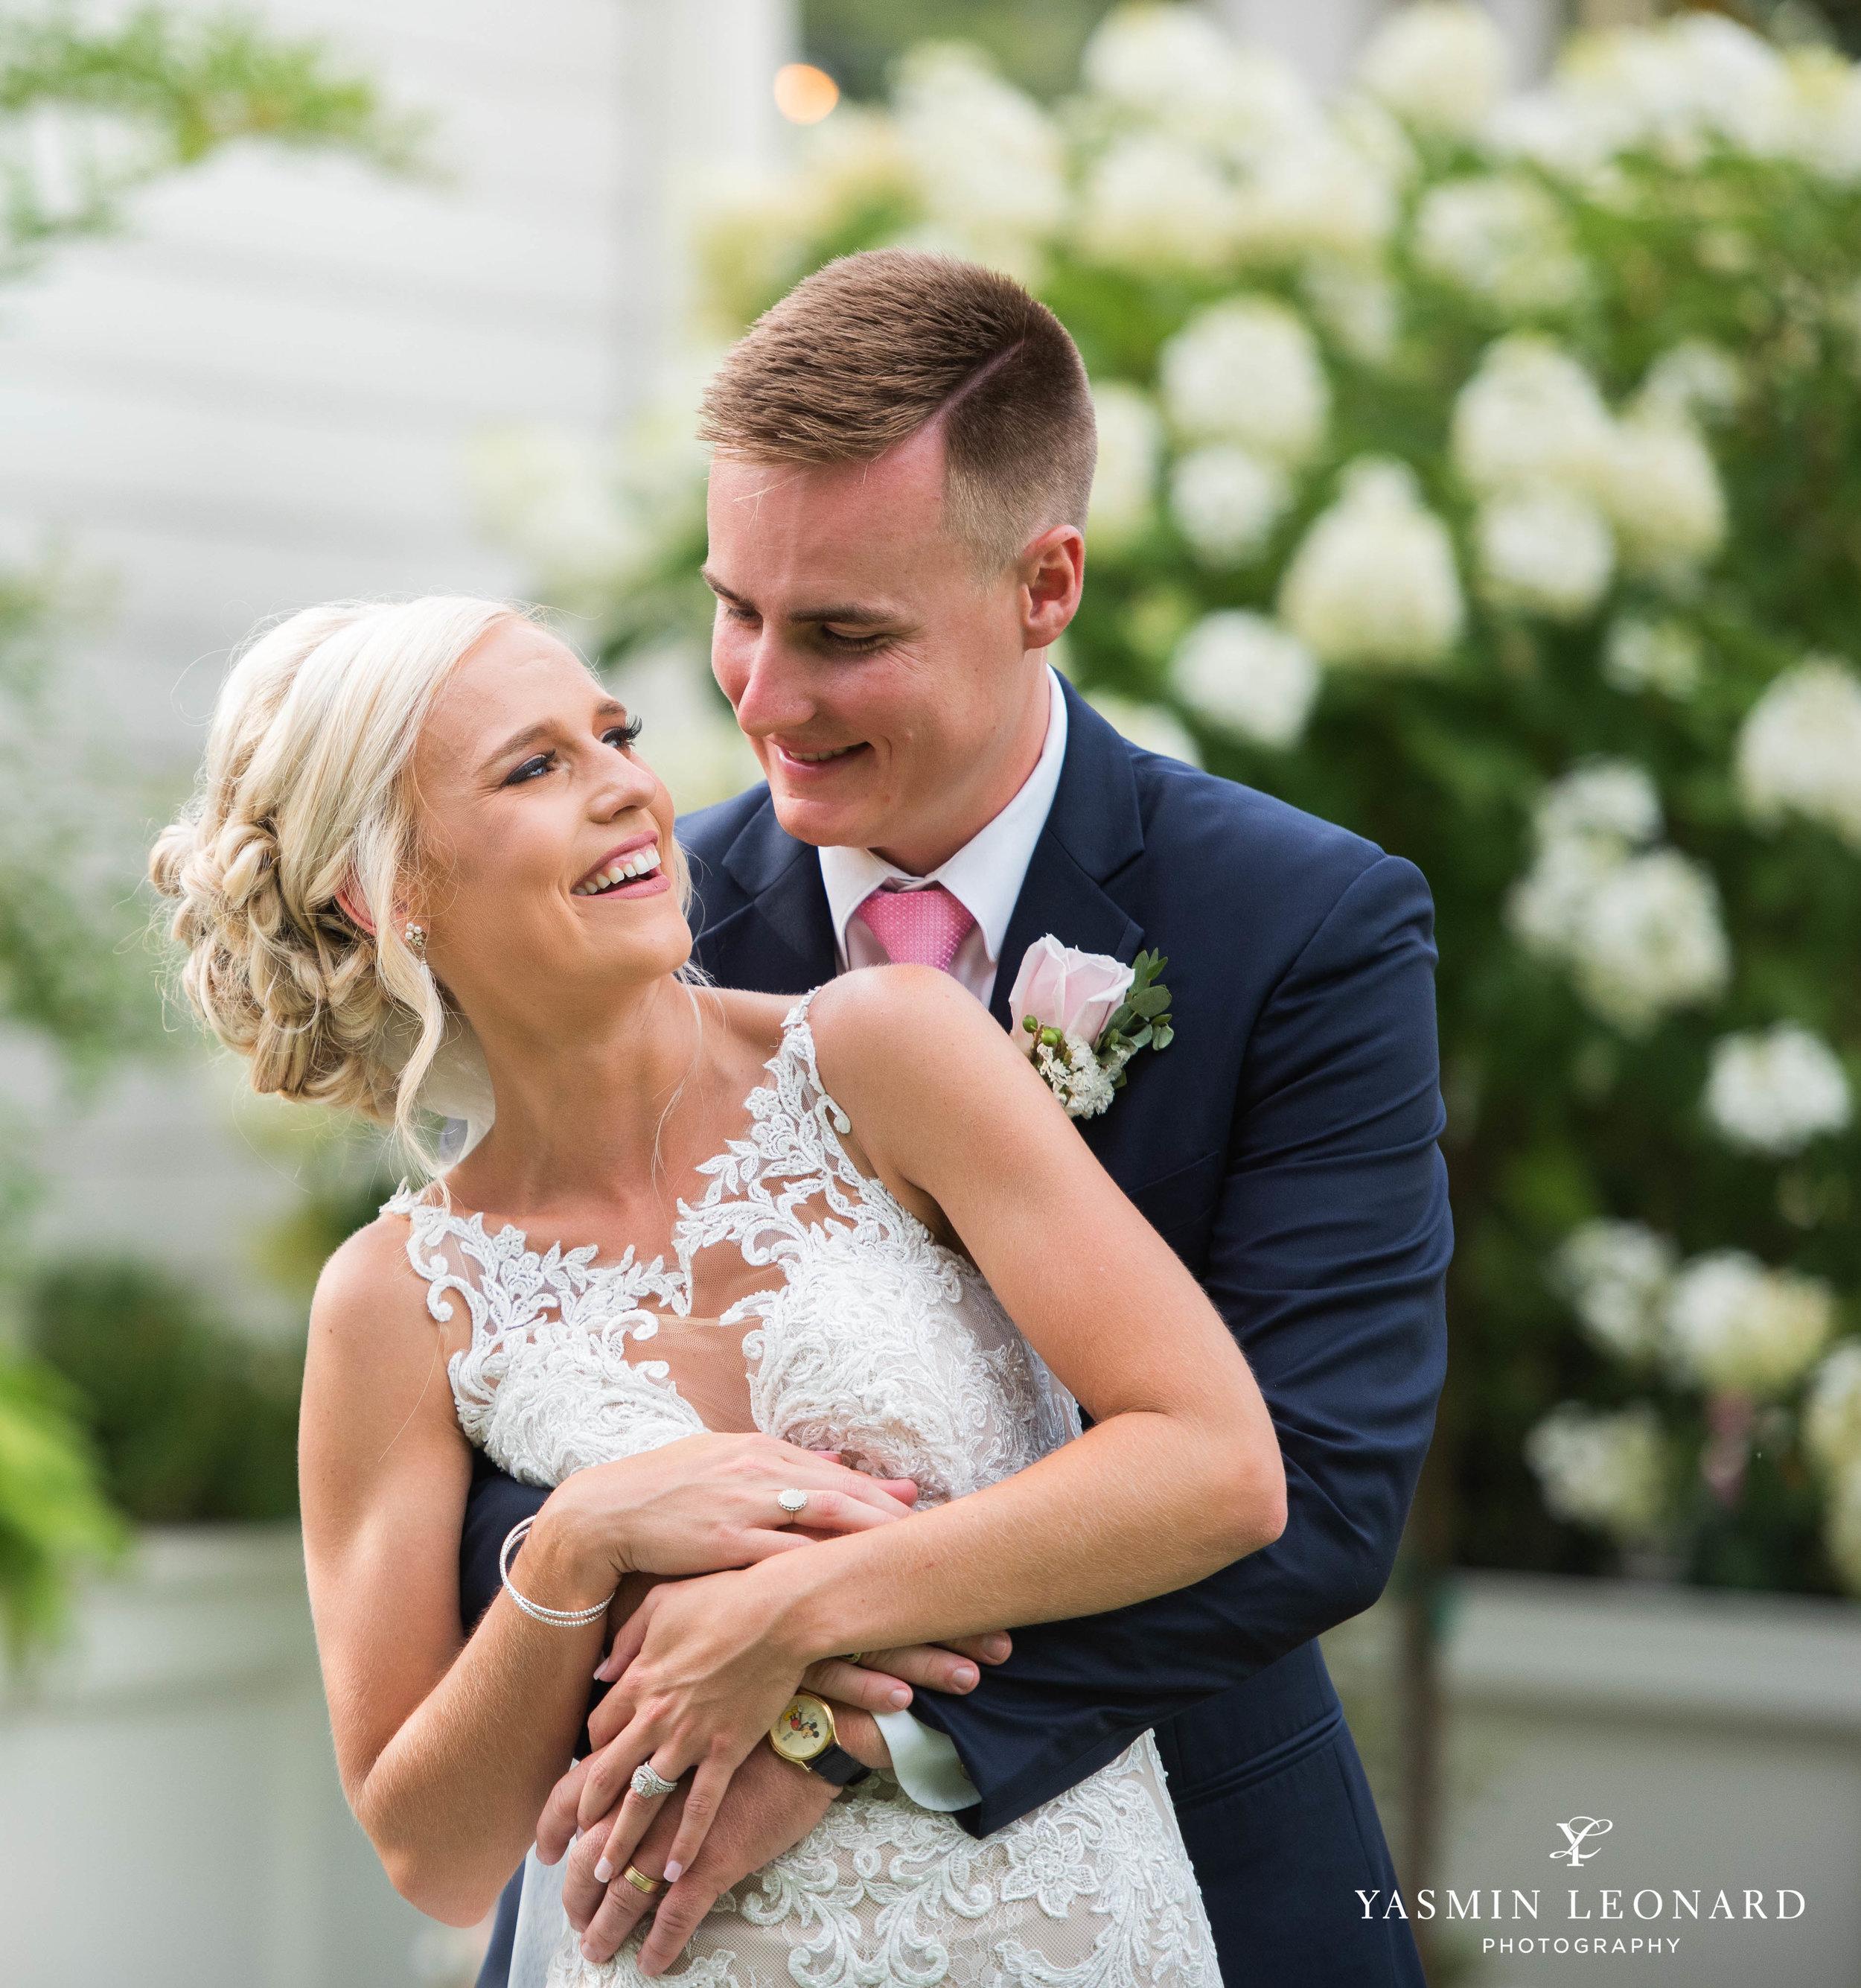 Separk Mansion - NC Weddings - Gastonia Wedding - NC Wedding Venues - Pink and Blue Wedding Ideas - Pink Bridesmaid Dresses - Yasmin Leonard Photography-33.jpg